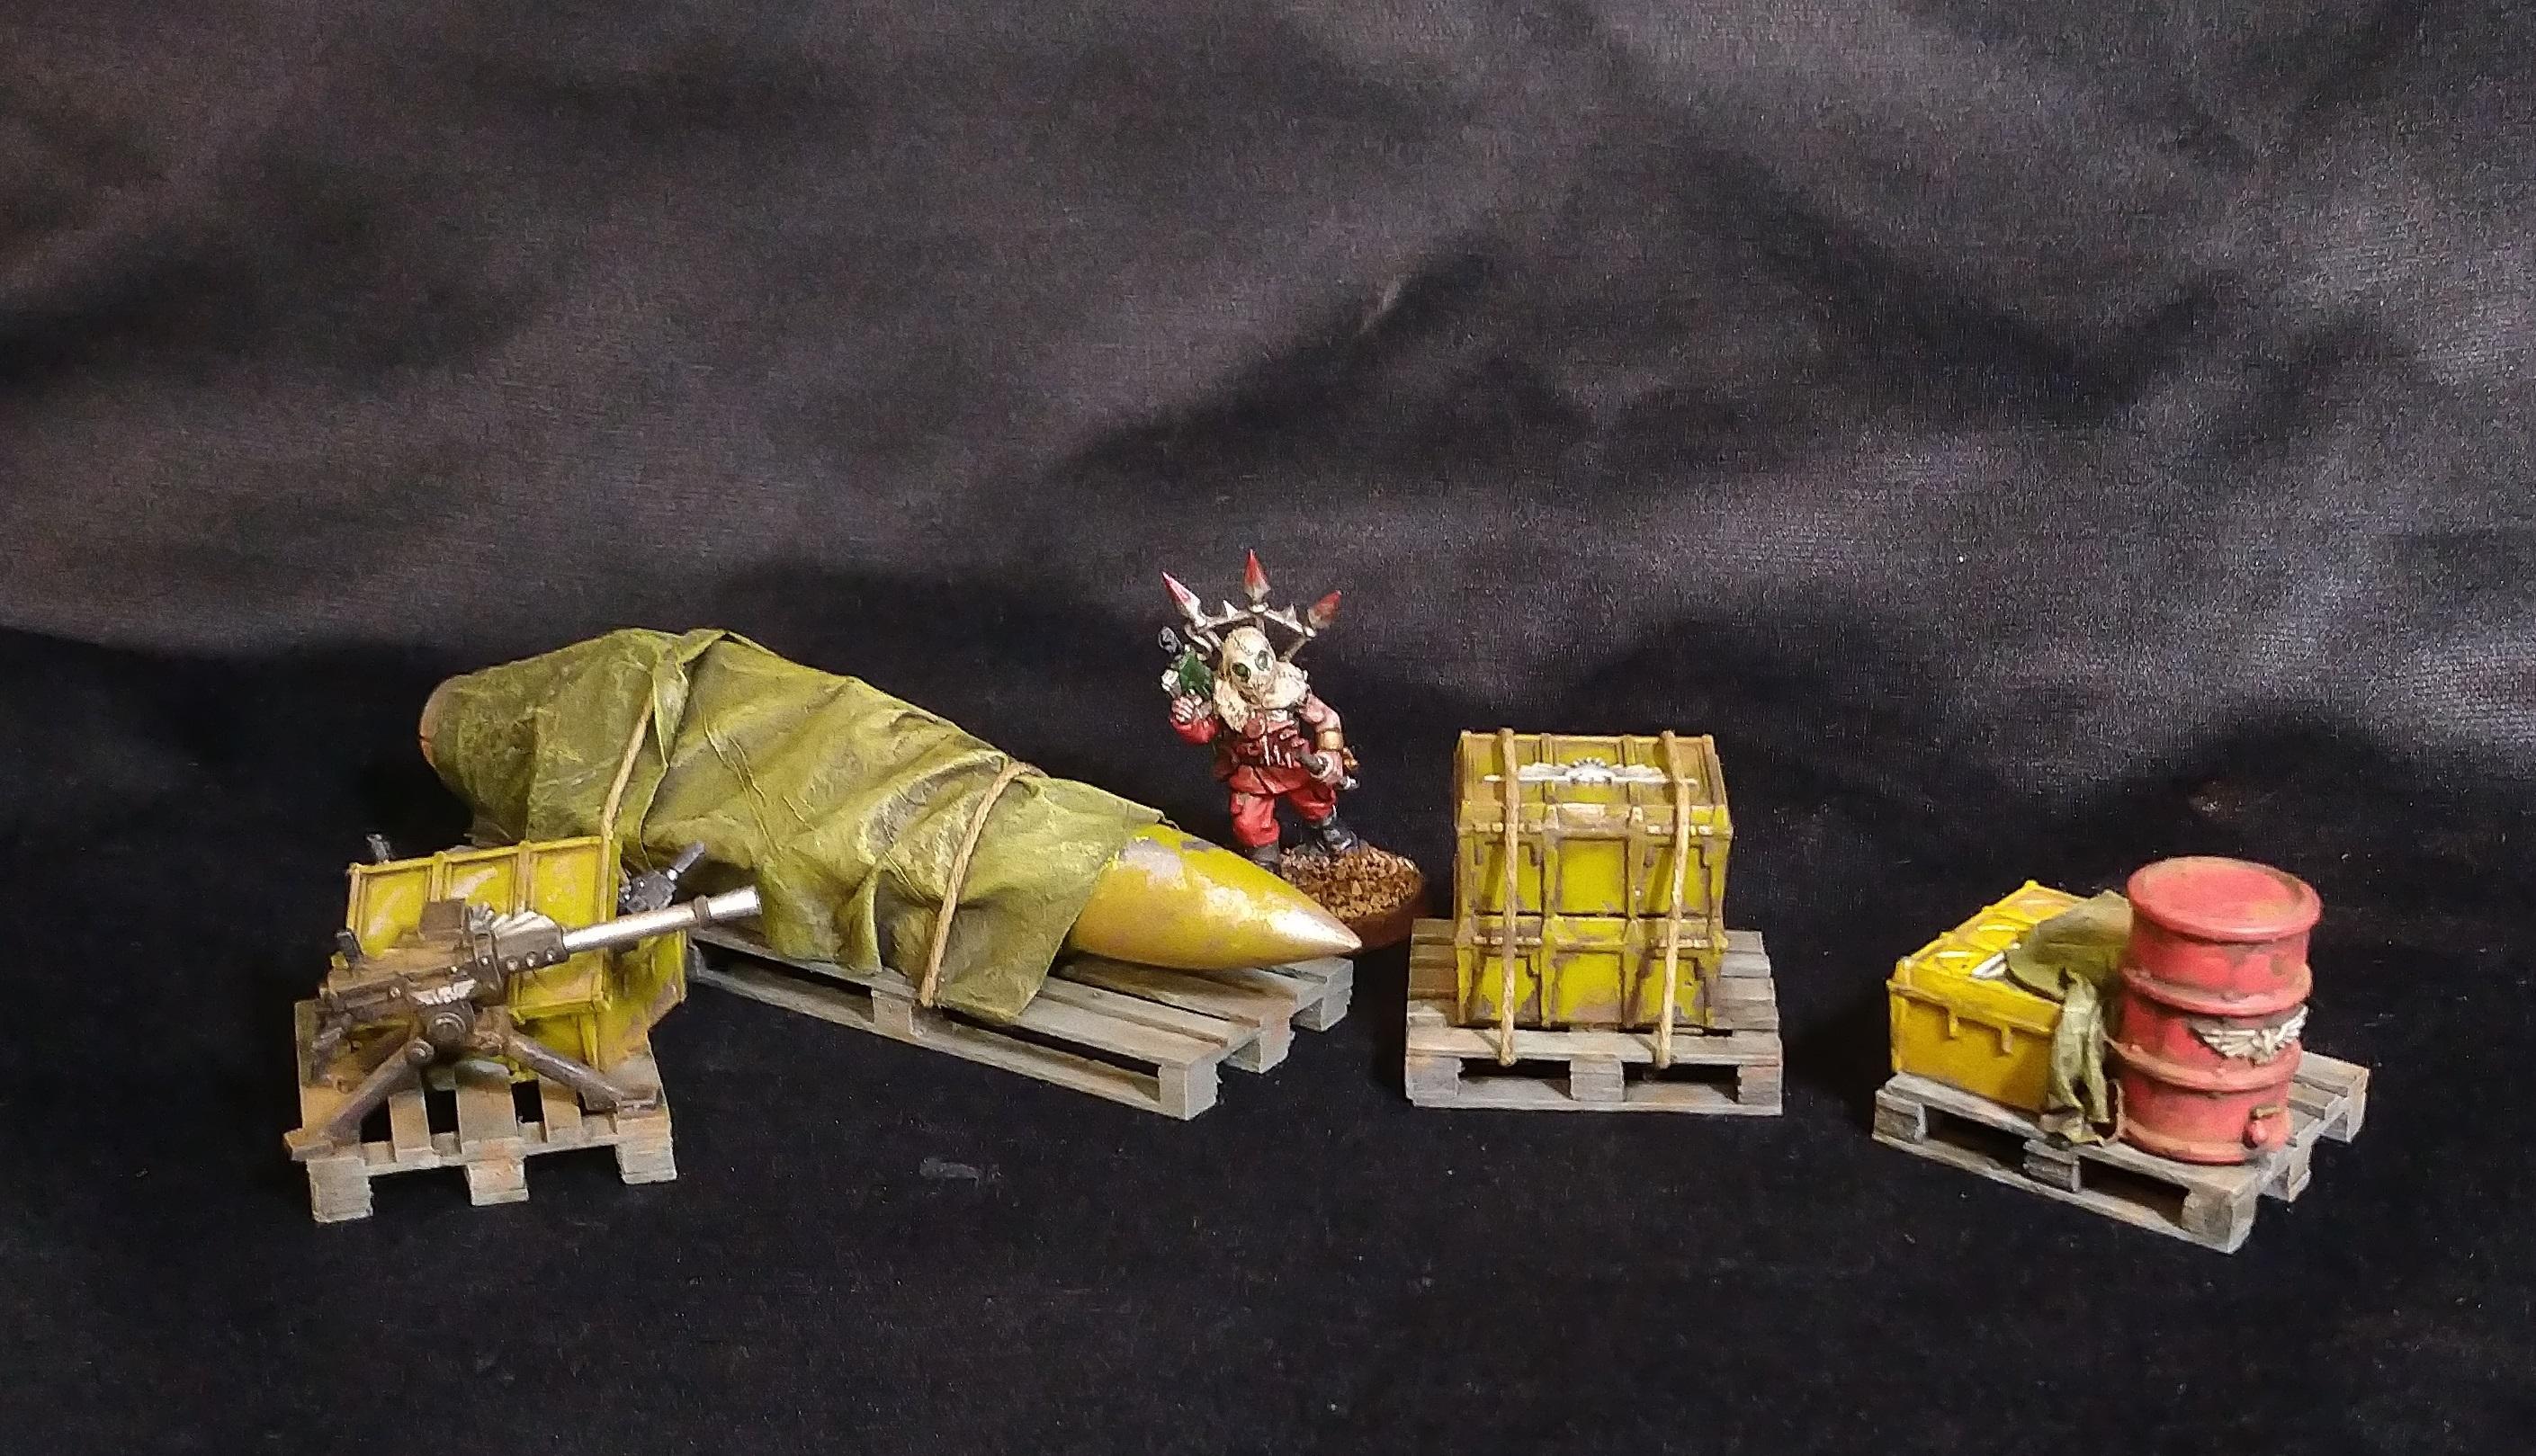 Container, Crates, Terrain, Warhammer 40,000